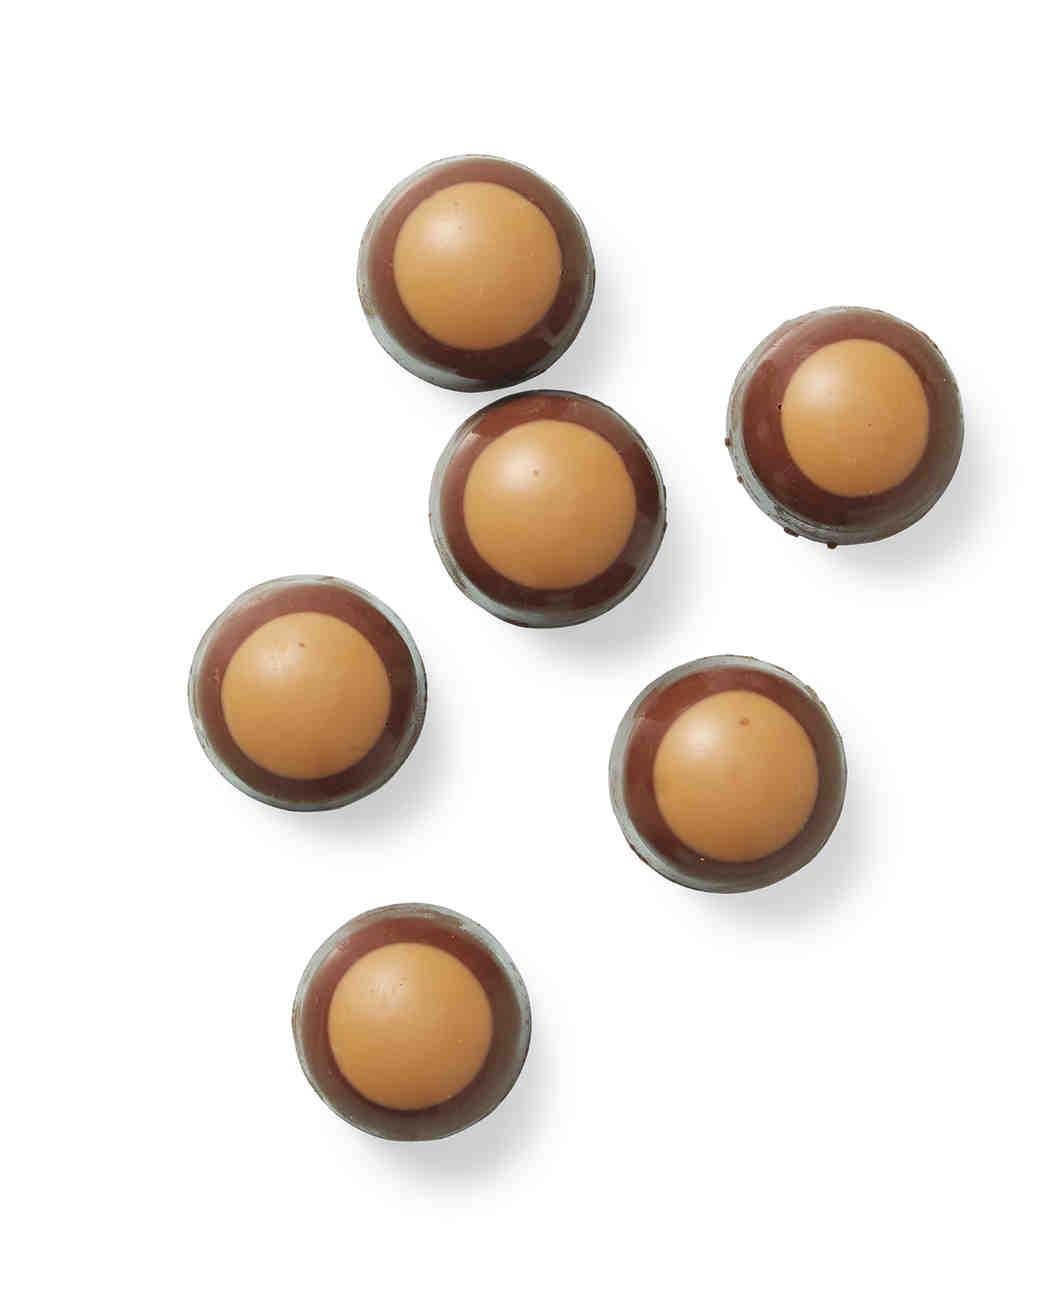 ohio-oh-chocolates-225-d111965.jpg